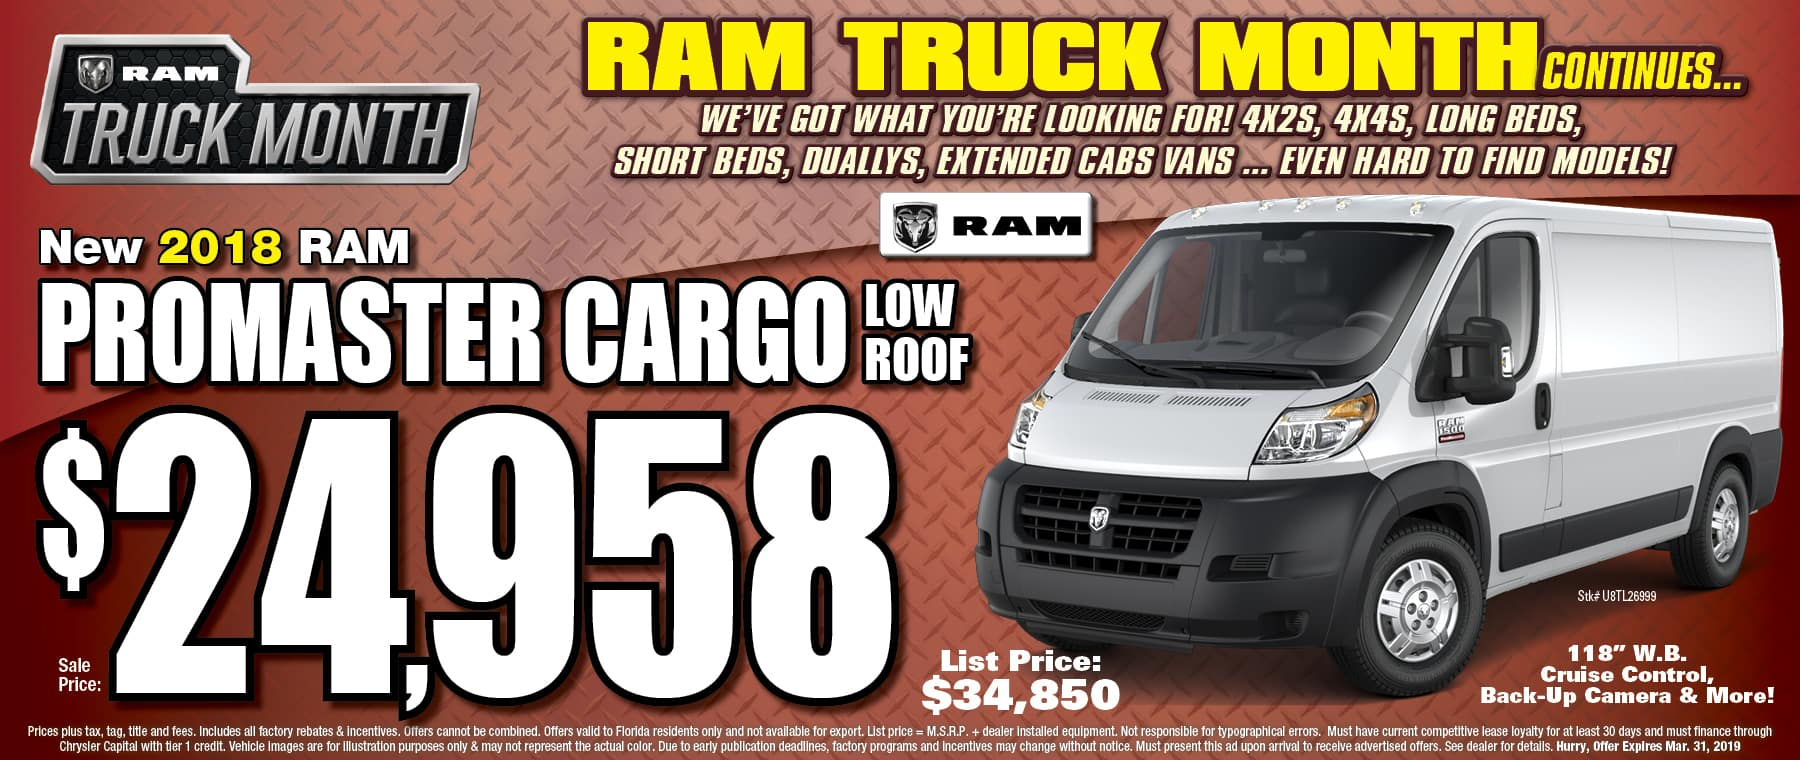 New Ram Promaster Cargo!